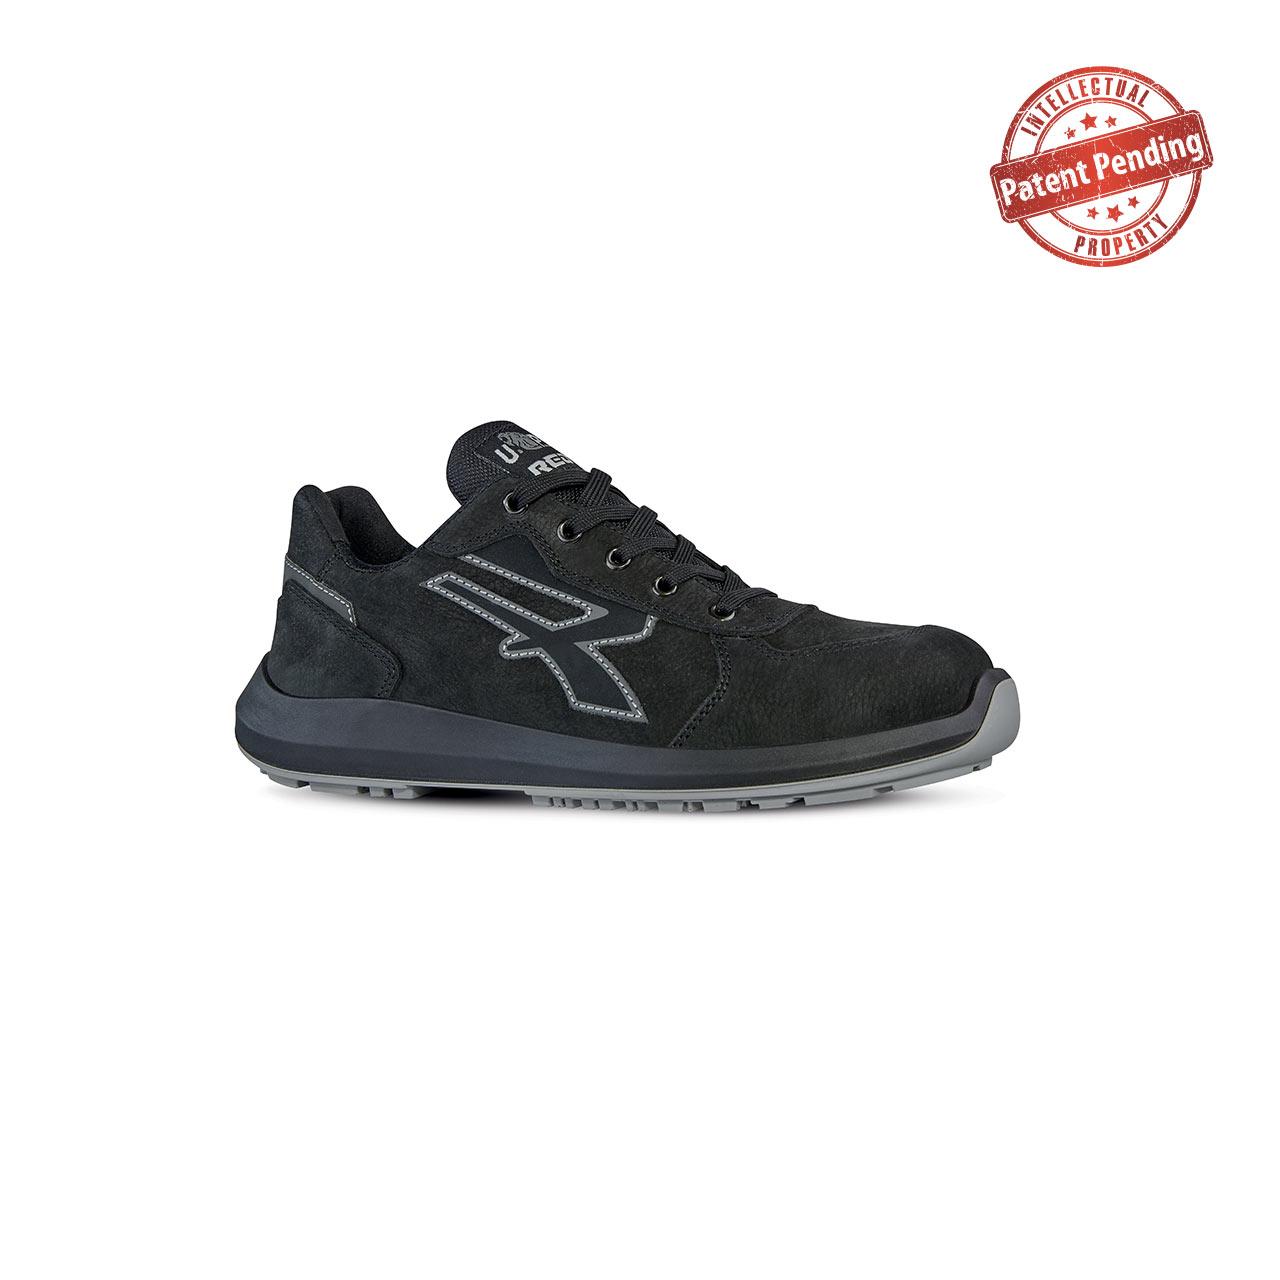 scarpa antinfortunistica alta upower modello shedir linea redup vista laterale